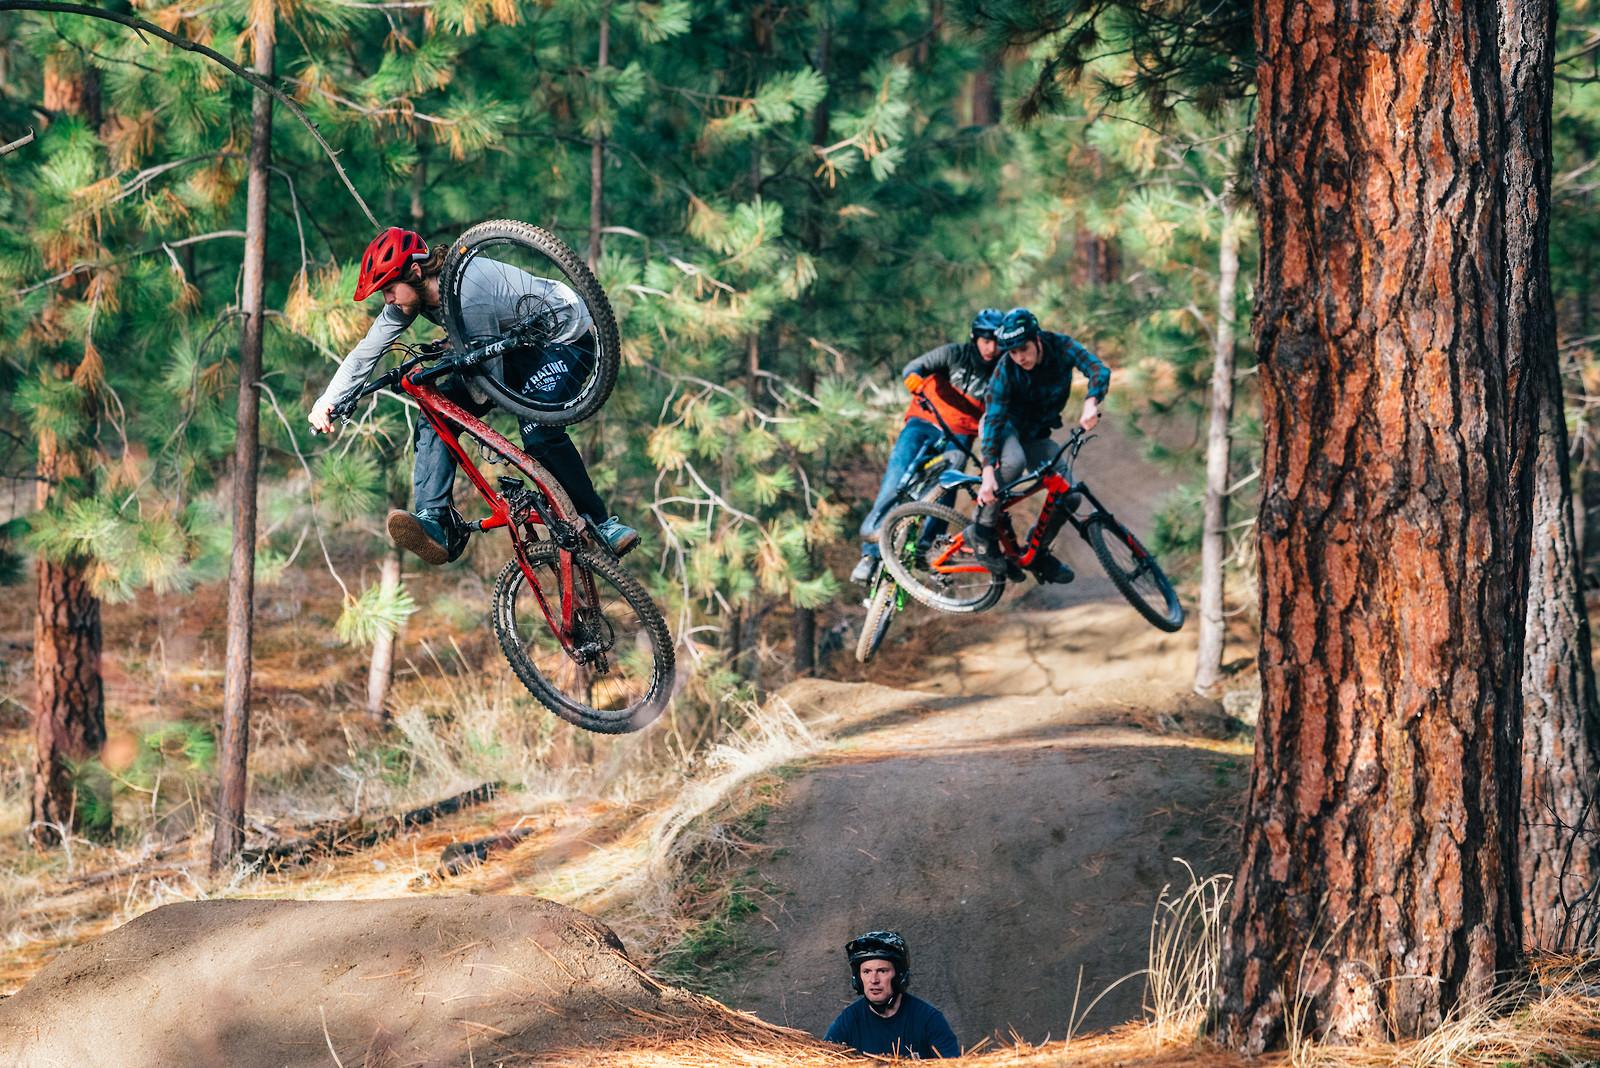 Steez Train - Schilly - Mountain Biking Pictures - Vital MTB